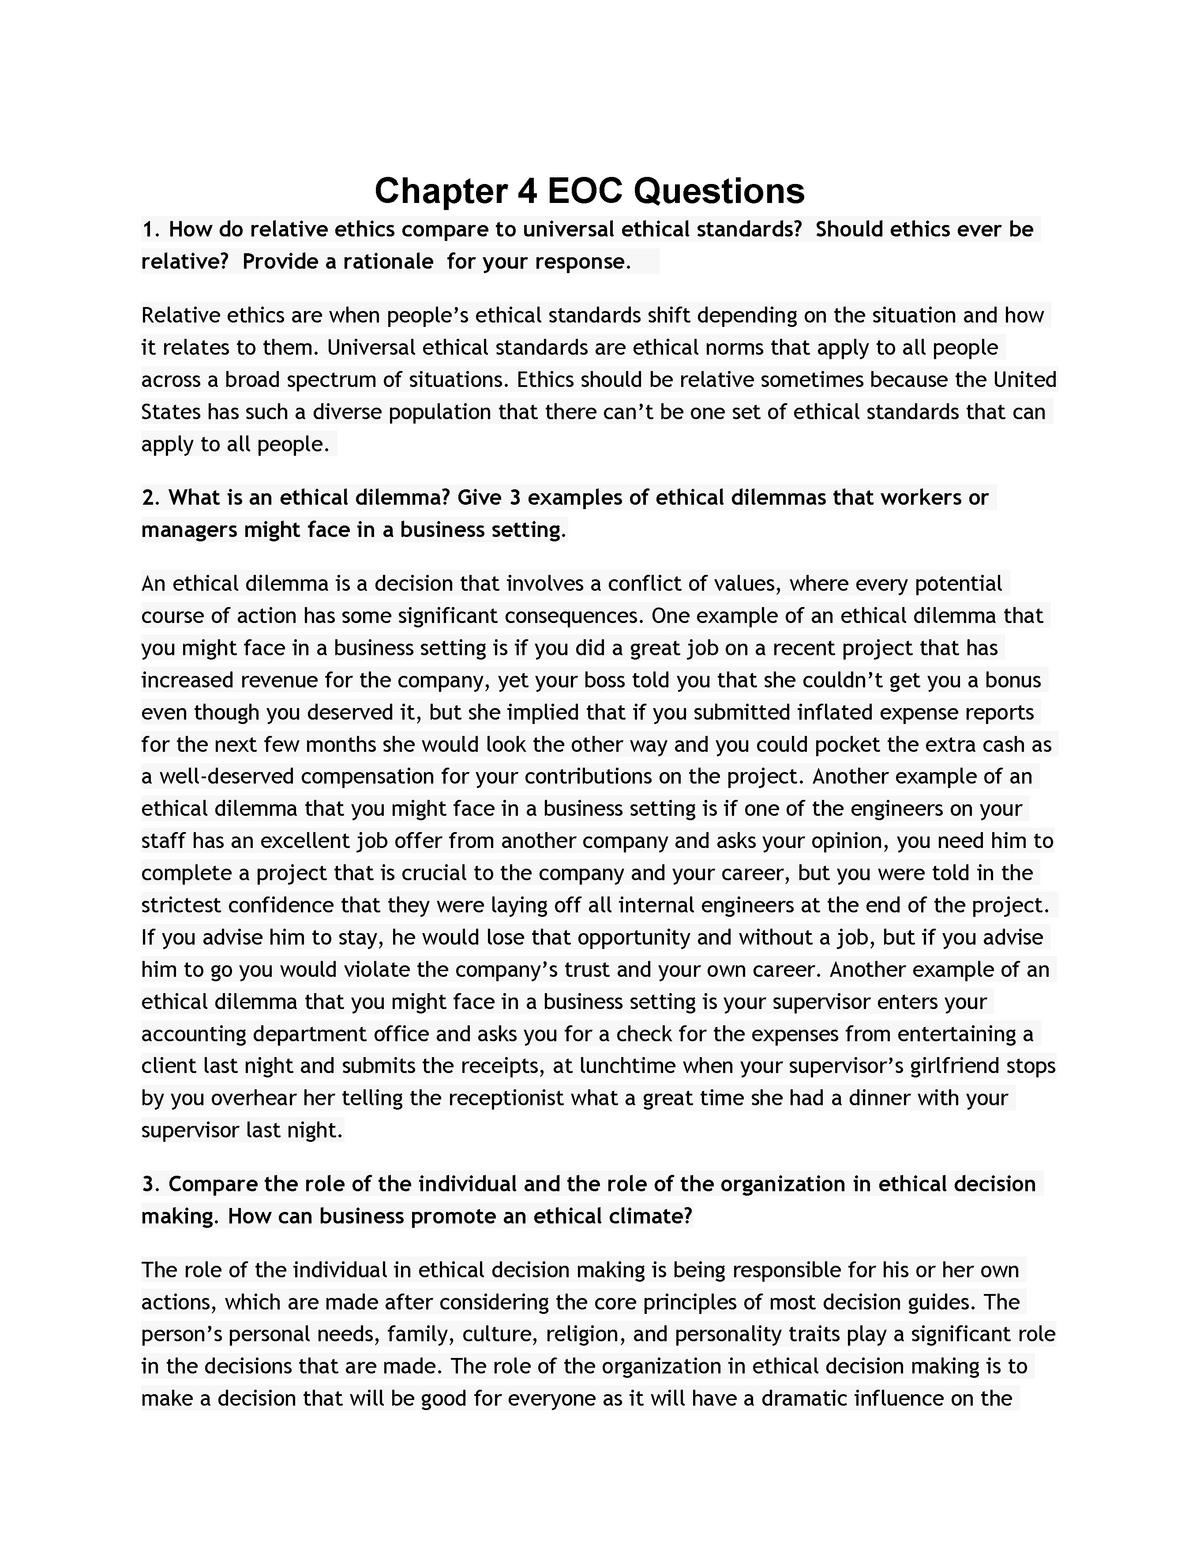 BUS 1750 - Chapter 4 EOC Questions - BUS 1750 - WMU - StuDocu